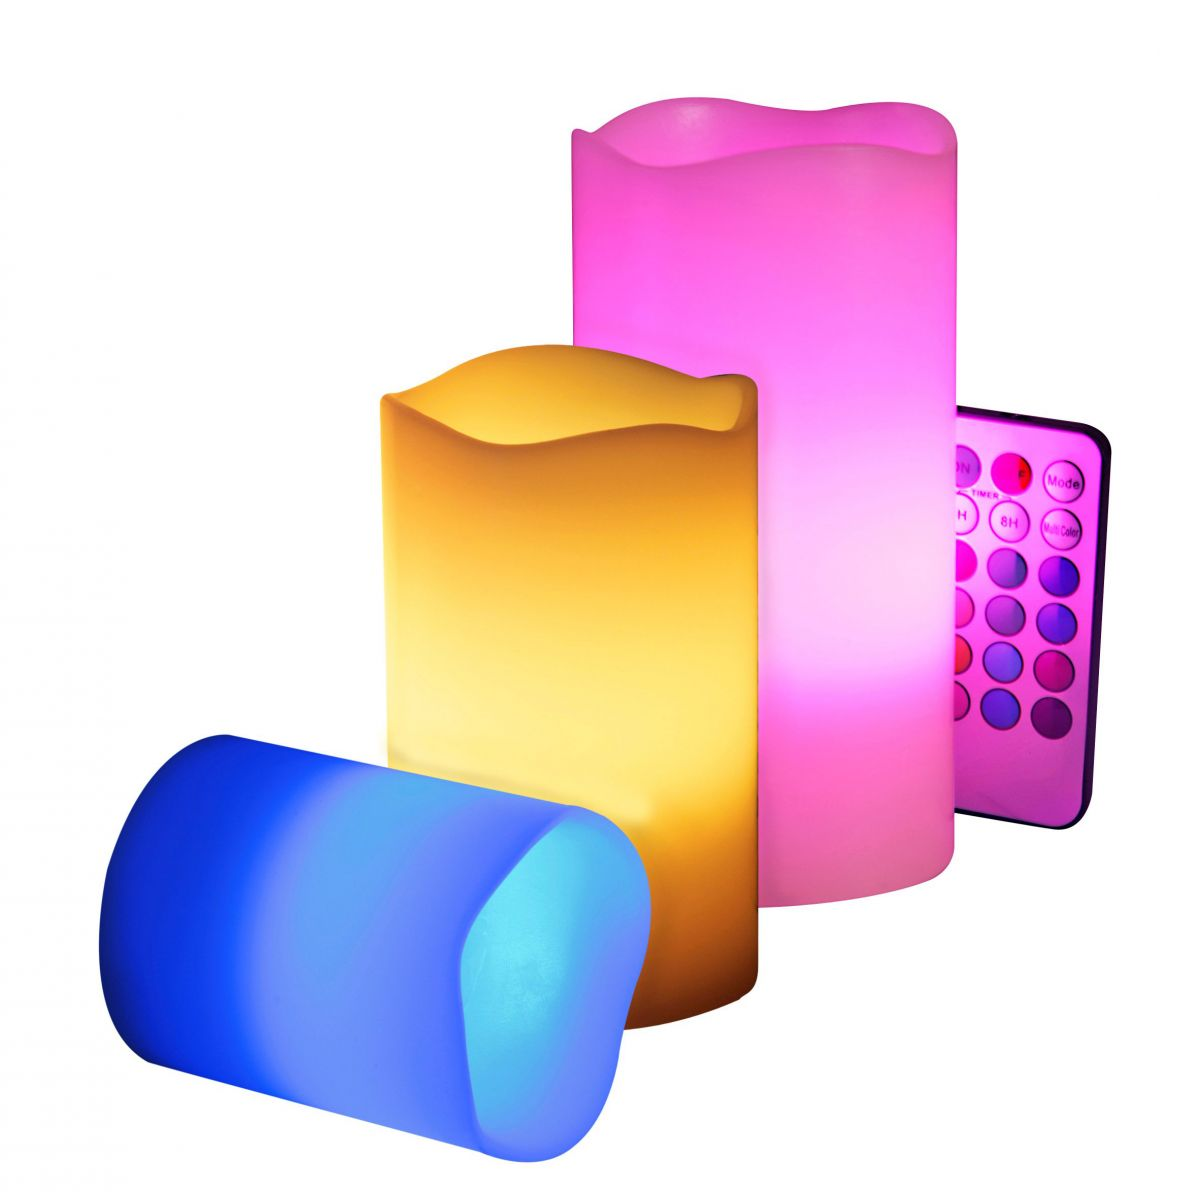 Kit 3 Velas Led - Multi Color Controle Remoto  - Thata Esportes